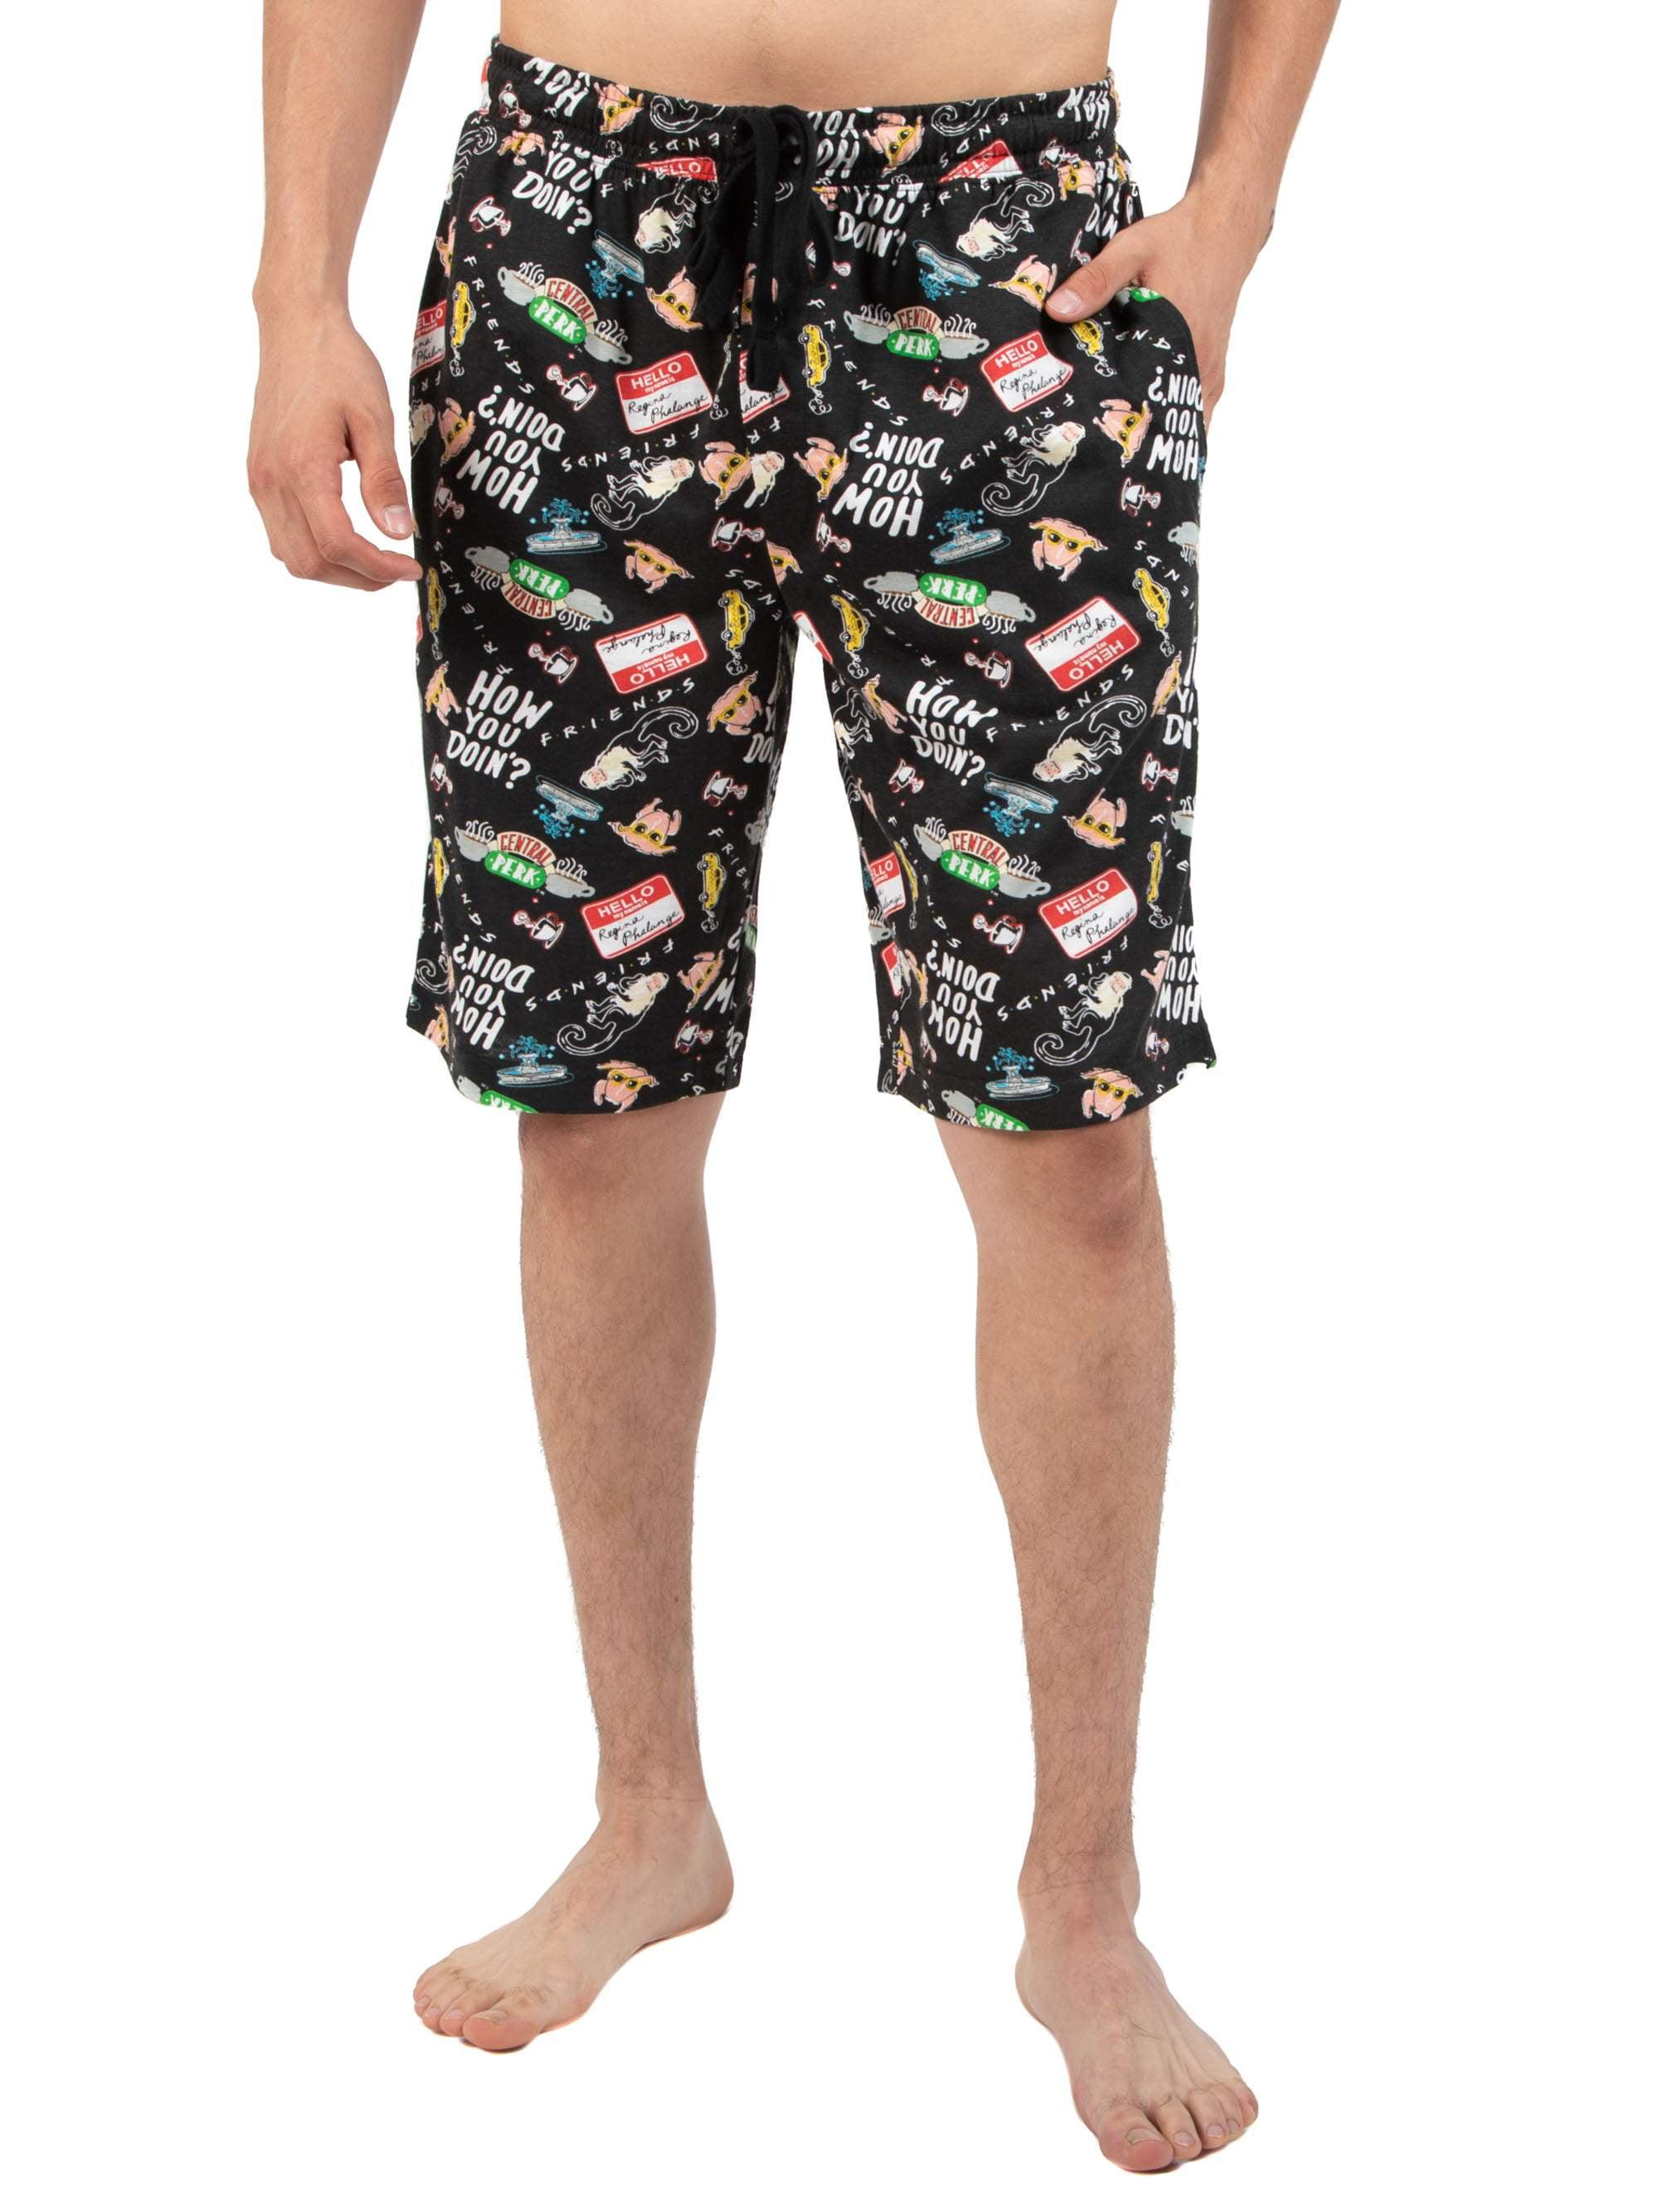 FANTASY SPACE Mens Big /&Tall Swim Trunks Board Shorts Basic Beachwear with Pockets